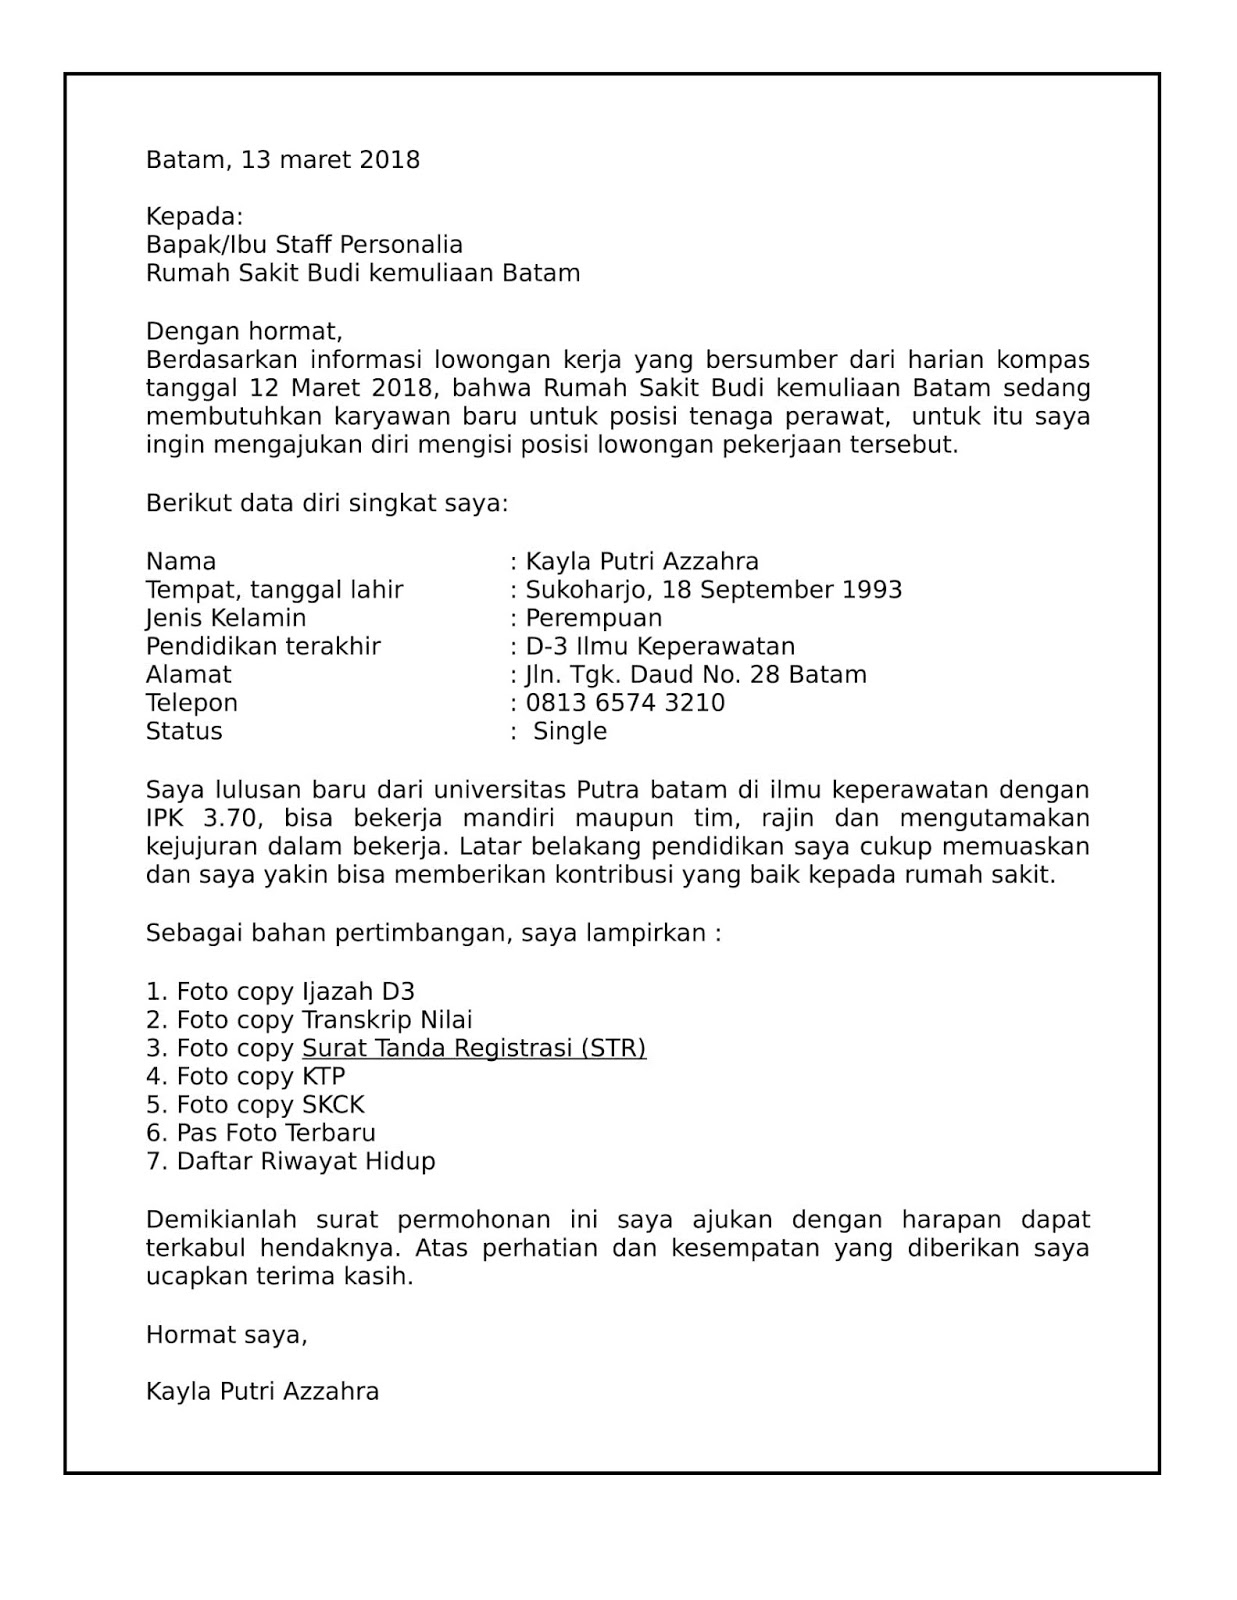 Contoh Surat Lamaran Kerja Untuk Perawat Gigi